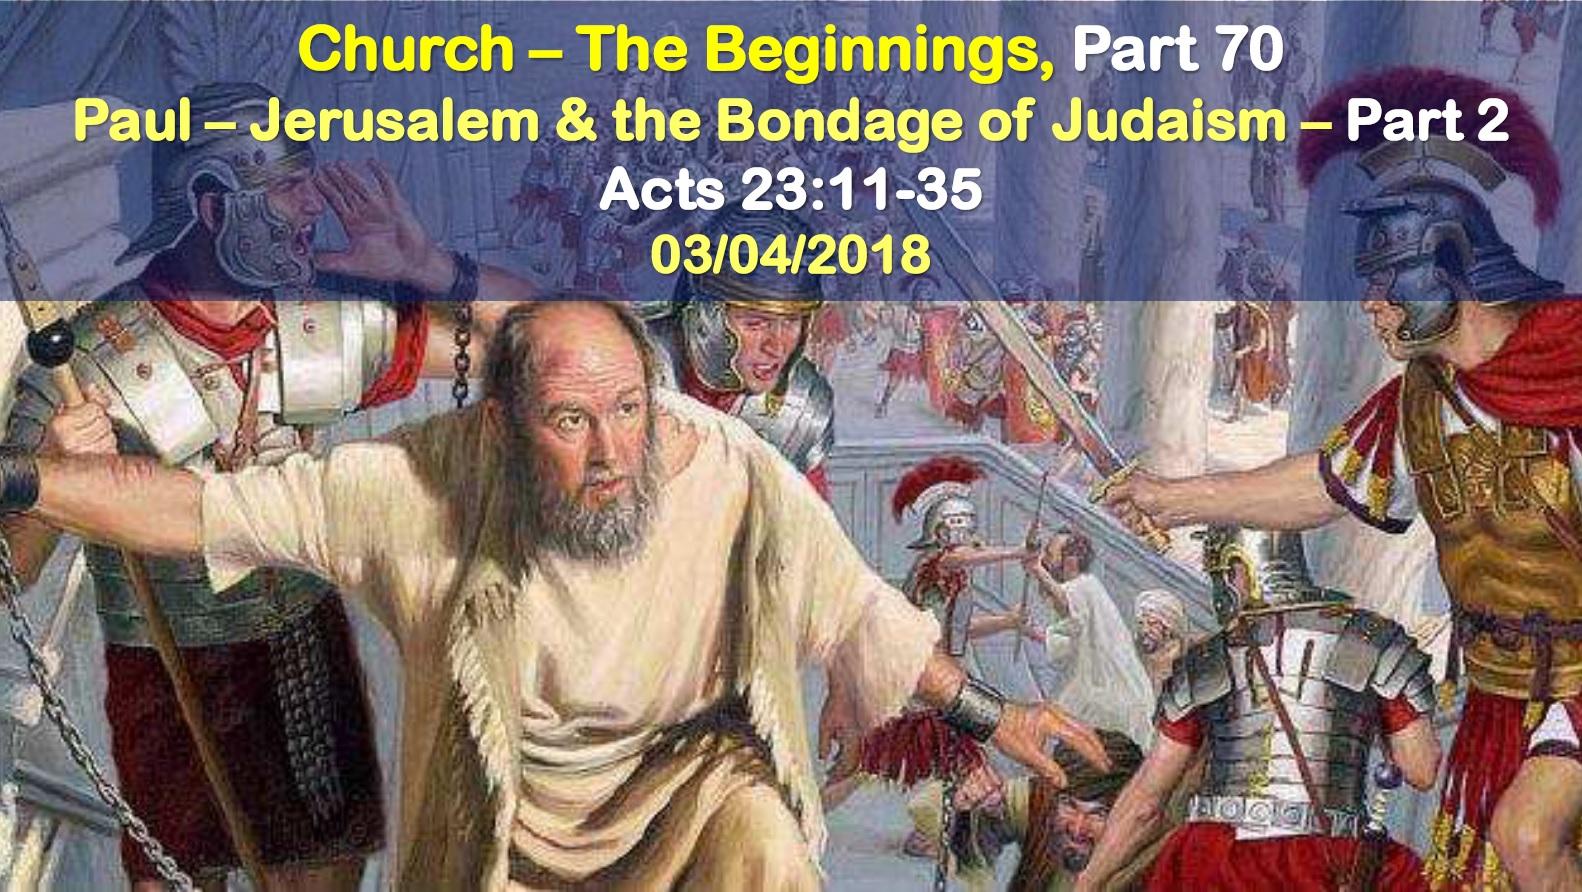 Paul – Jerusalem & the Bondage of Judaism – Part 2